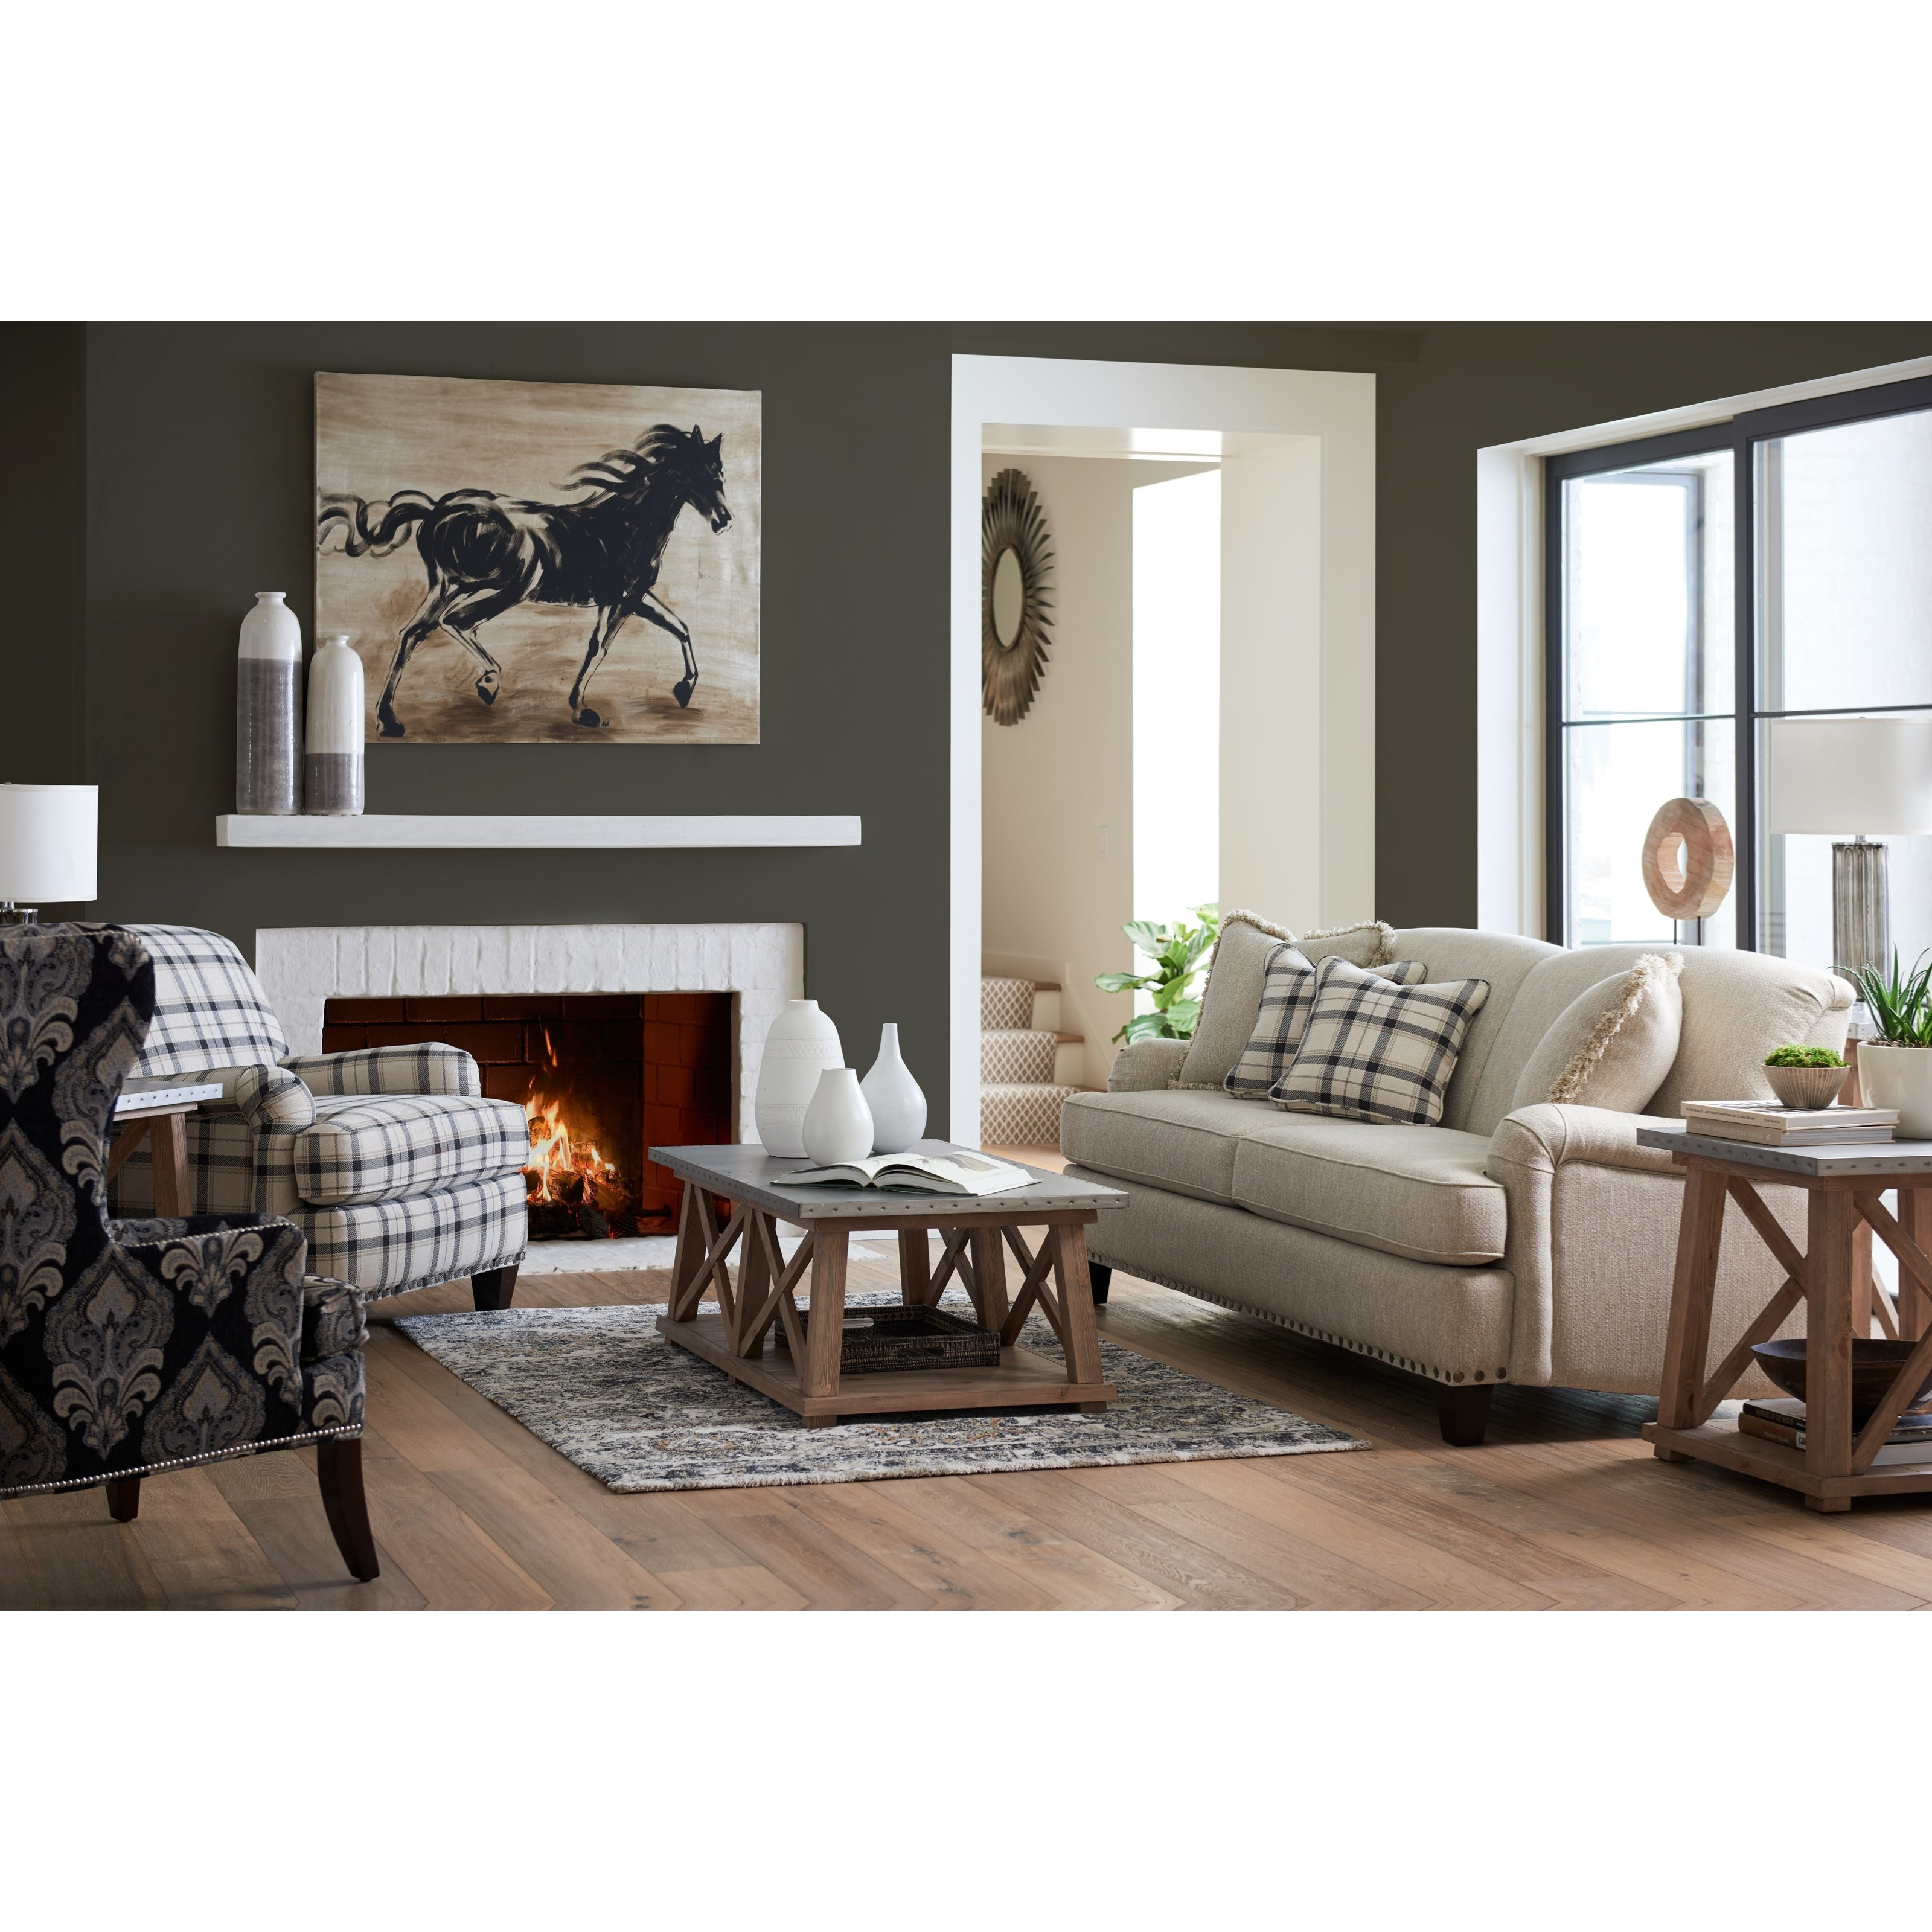 Living Room Furniture North York: La-Z-Boy York Traditional Sofa With Premier ComfortCore